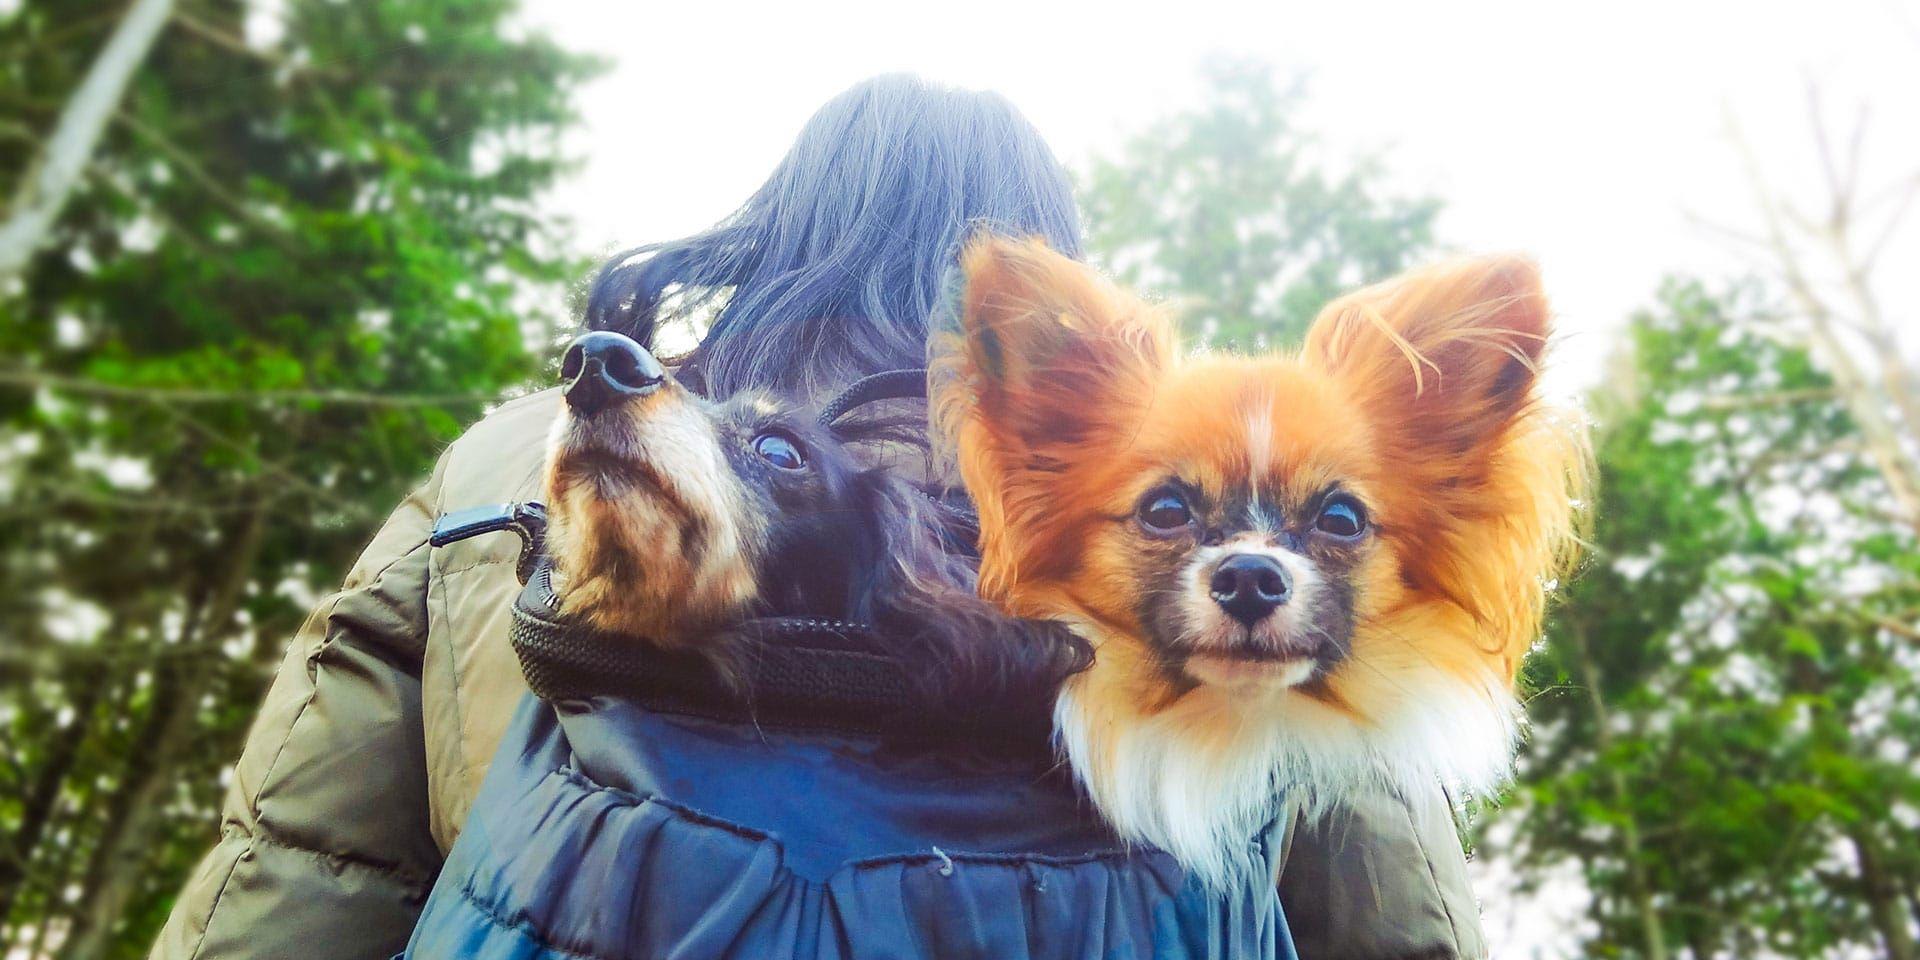 9380f2e8b742fb0ba2d327622ecc0bca - Better Homes And Gardens Pet Competition